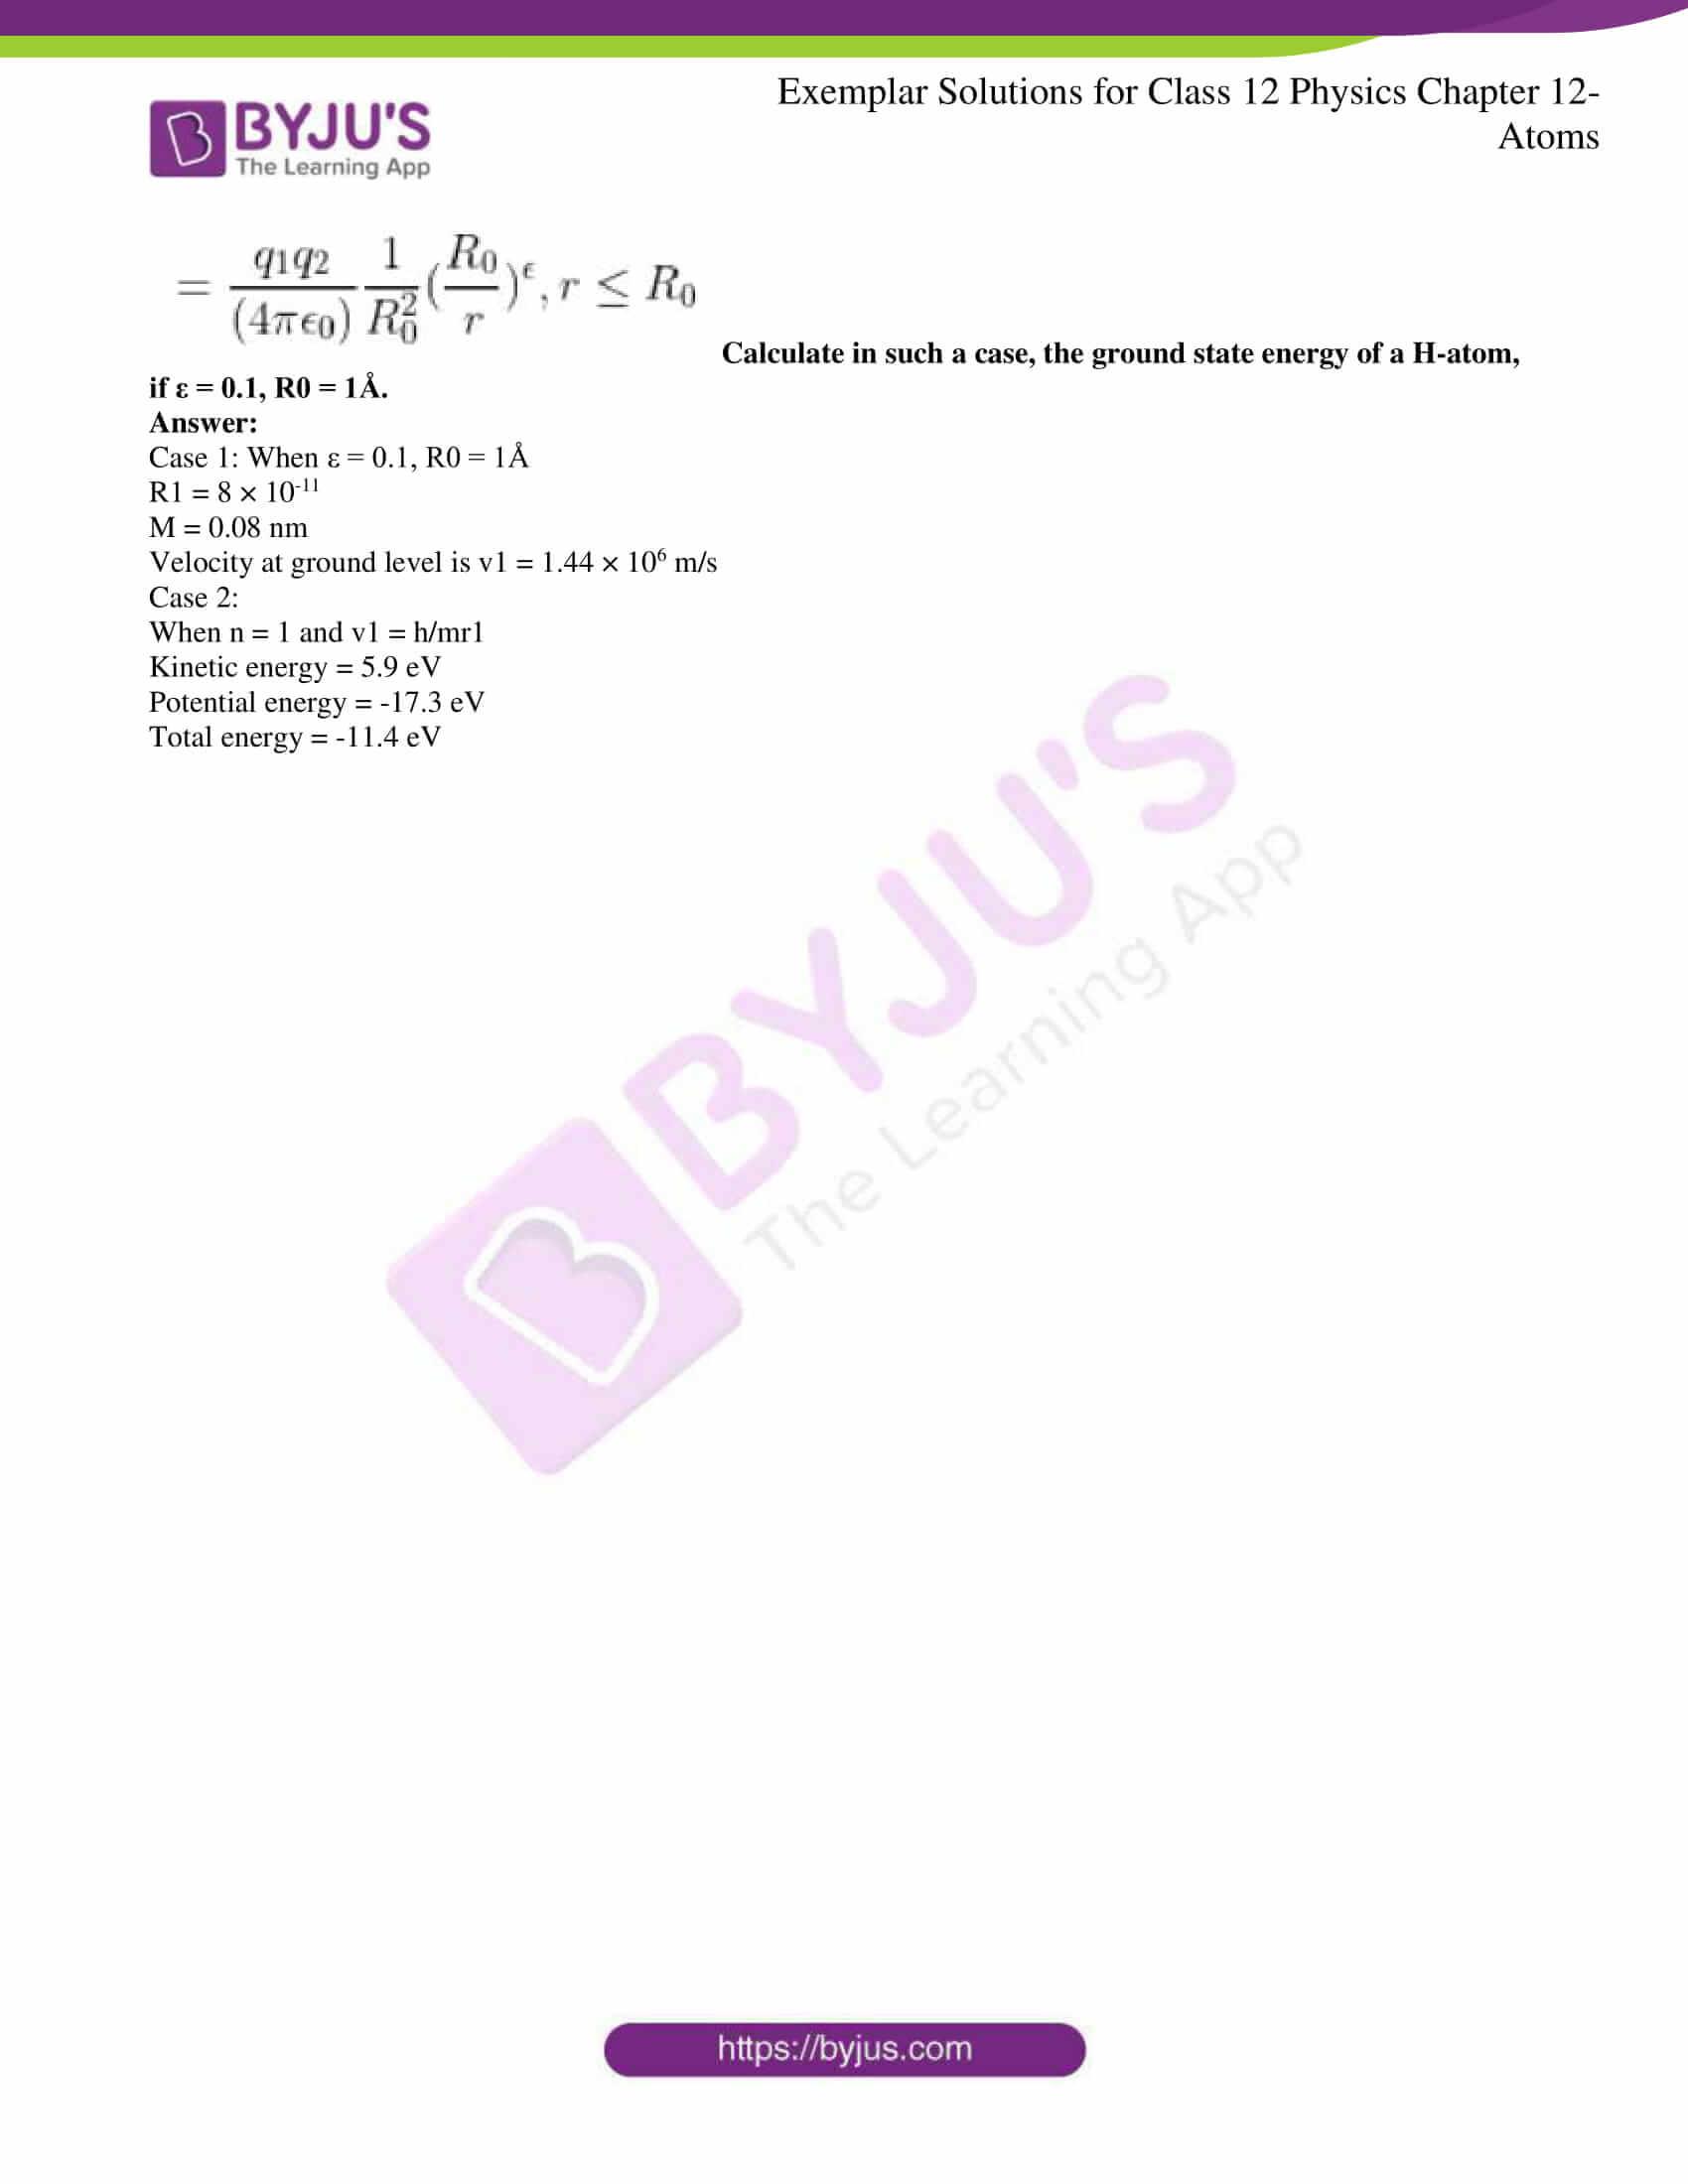 ncert exemplar solutions for class 12 physics chapter 12 7